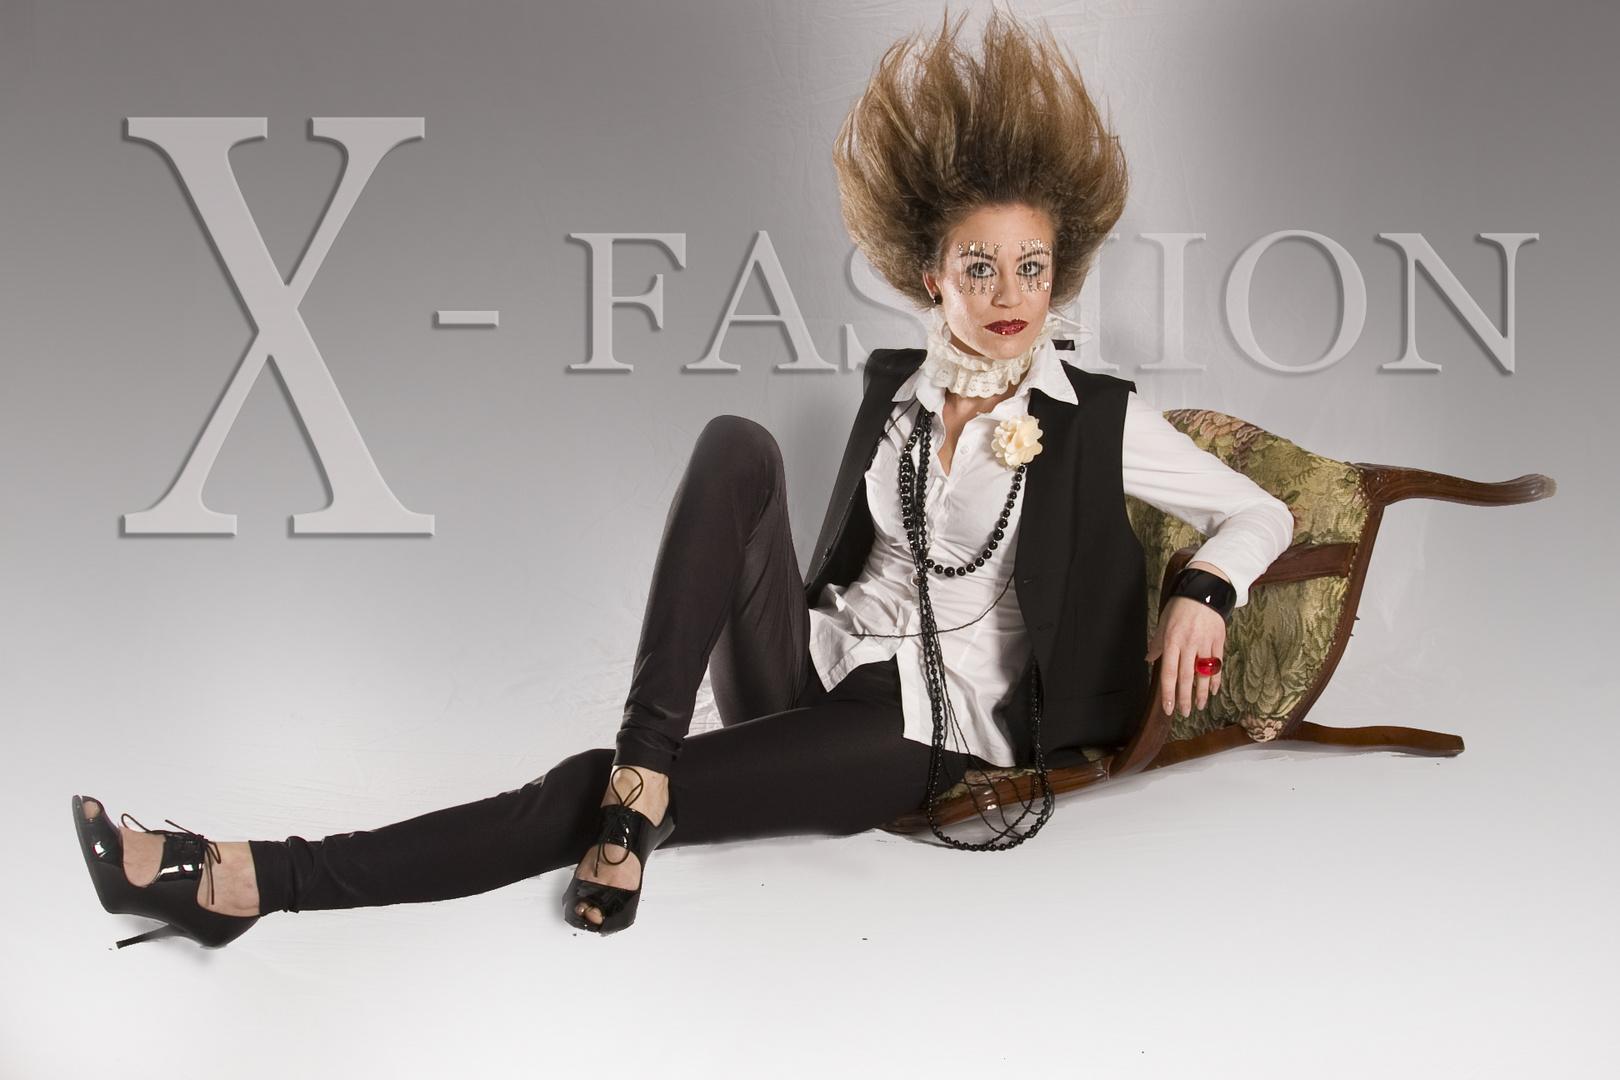 X-Fashion